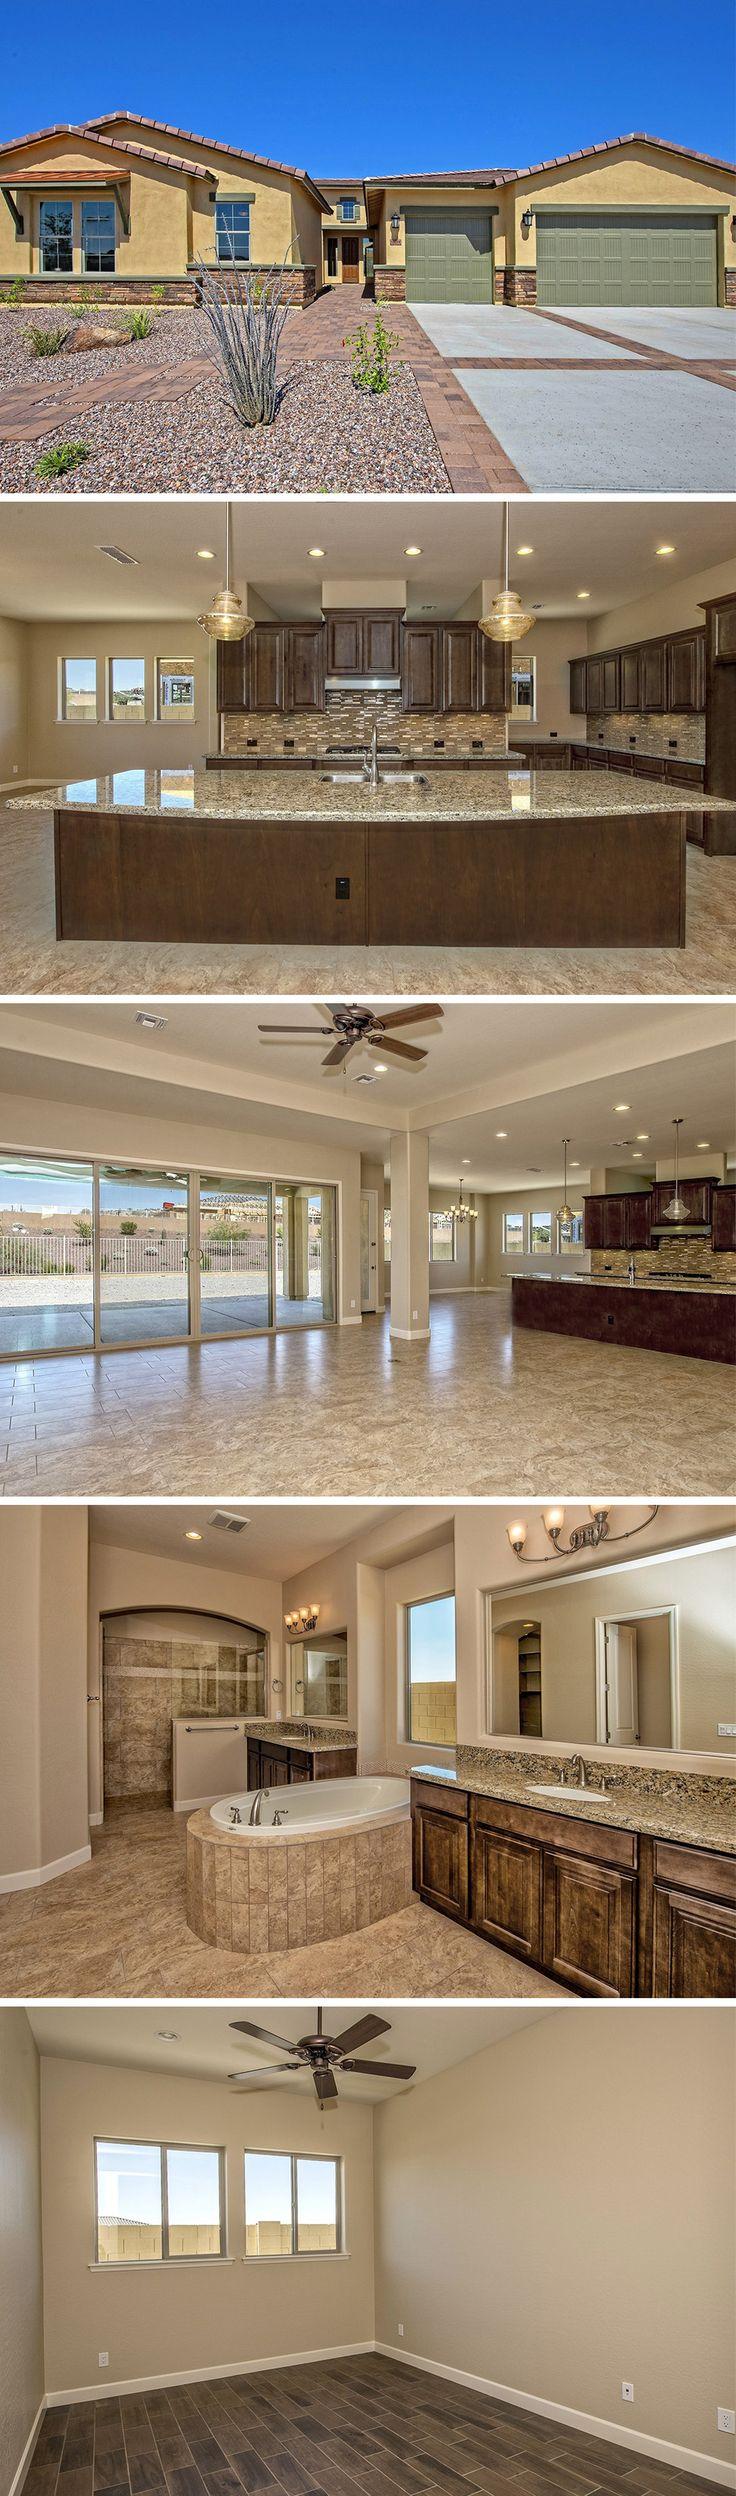 Luxury, single-story southwestern style home in Goodyear, AZ.